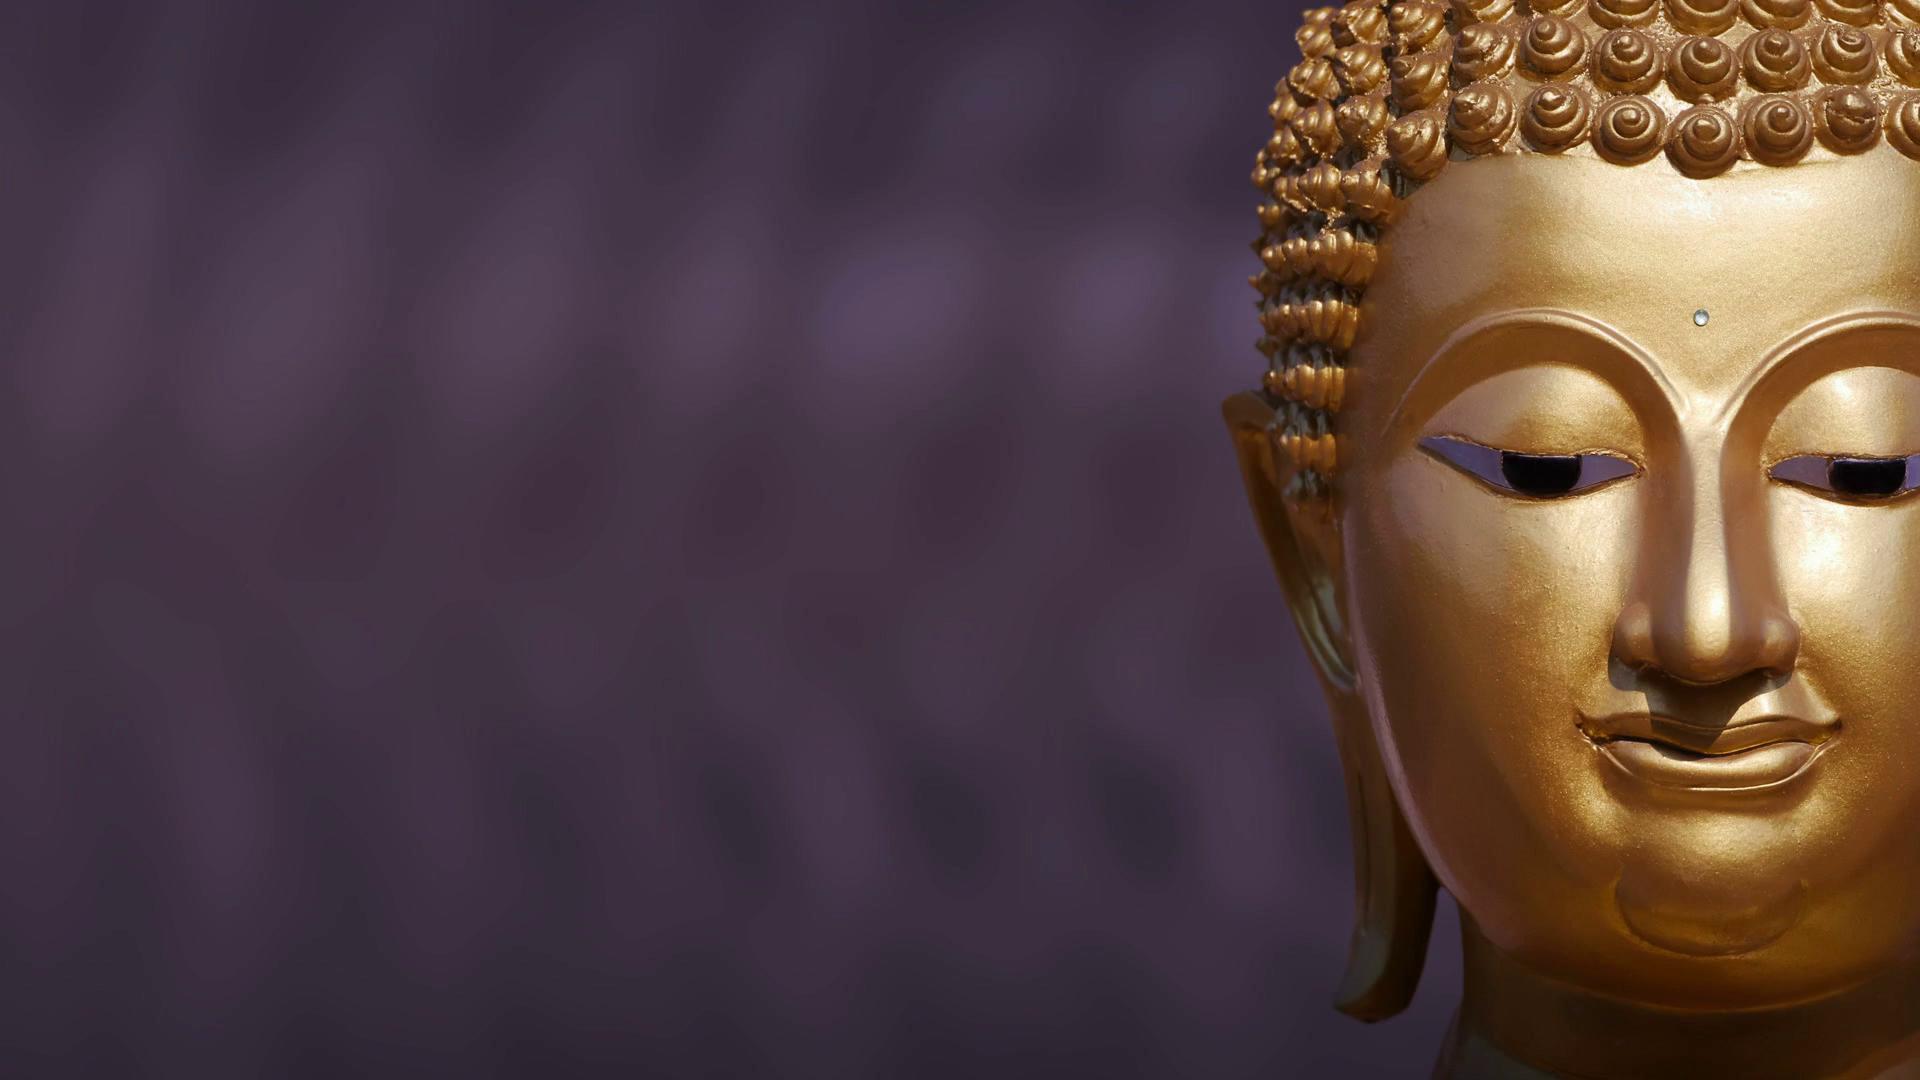 Golden Buddha statue close up ,Panning Stock Video Footage - Videoblocks